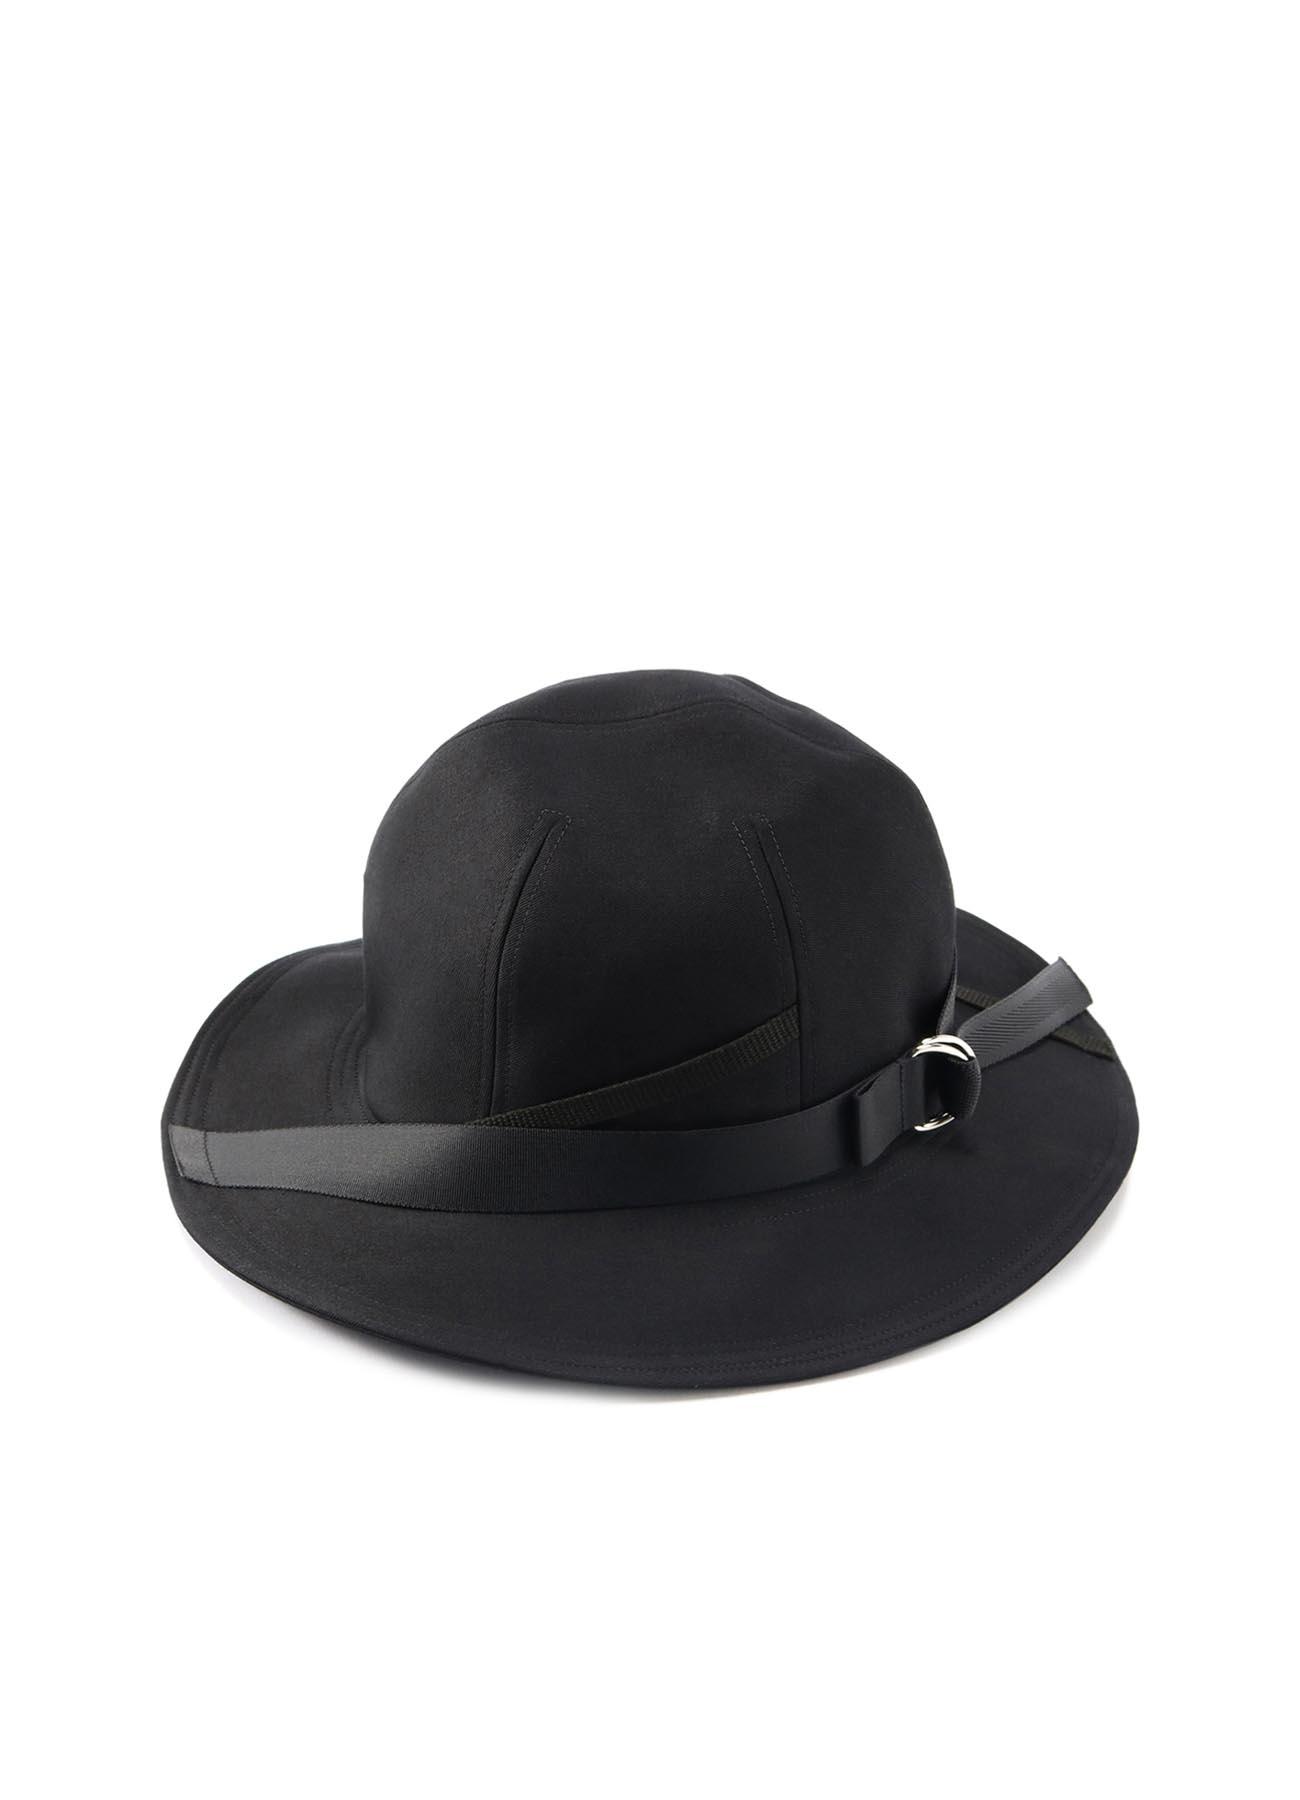 Ishica Cotton Gabardine Fatigue Hat